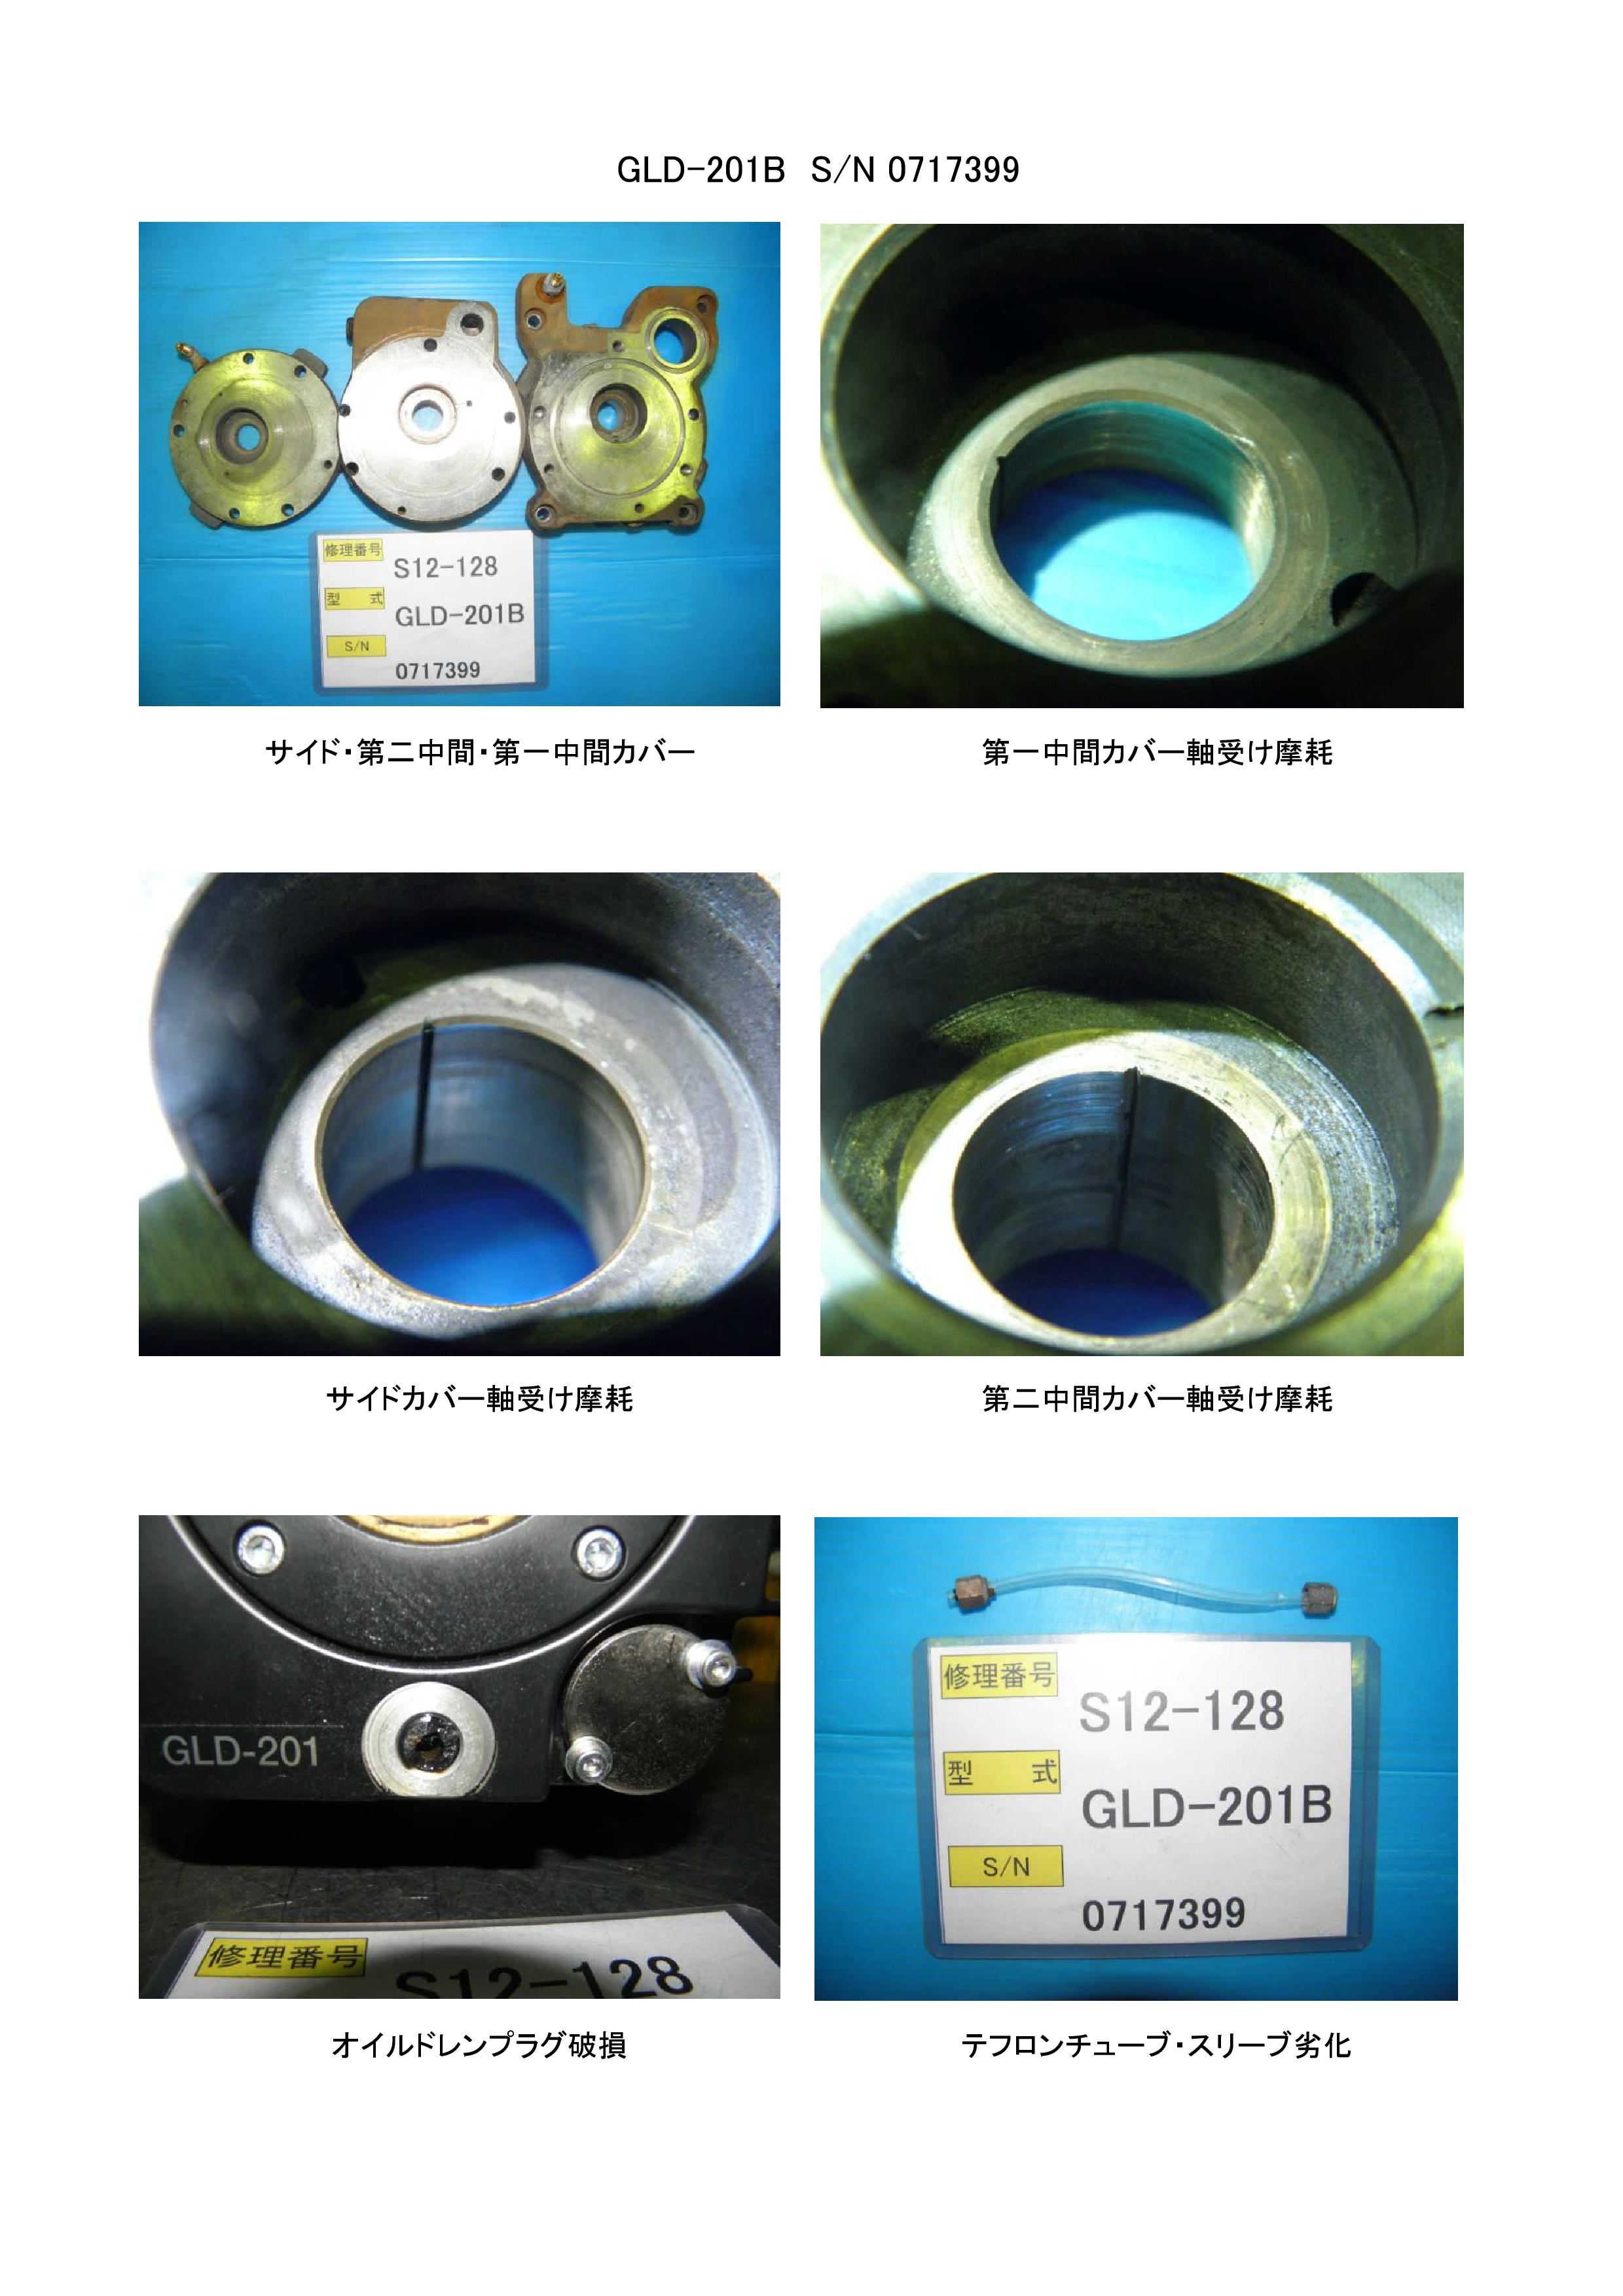 GLD-201B.0717399写真 -002.jpg